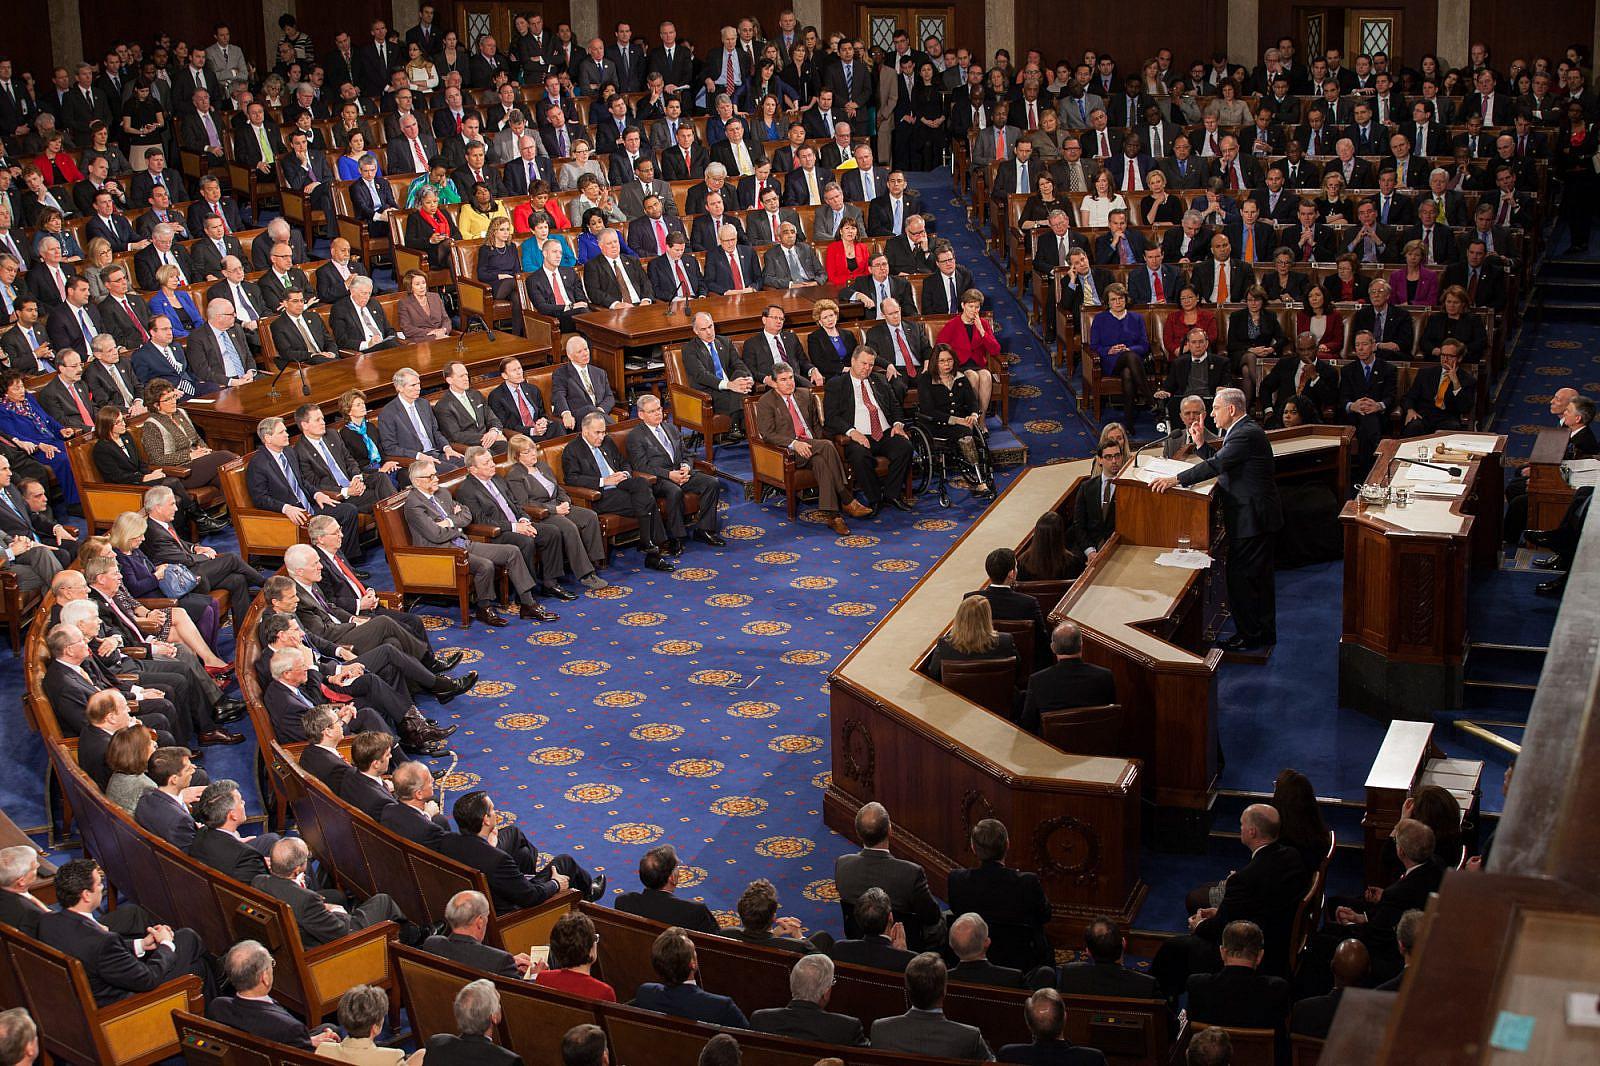 Israeli Prime Minister Benjamin Netanyahu speaking before the U.S. Congress, March 3, 2015. (Official Photo for Speaker John Boehner by Heather Reed/Flickr)